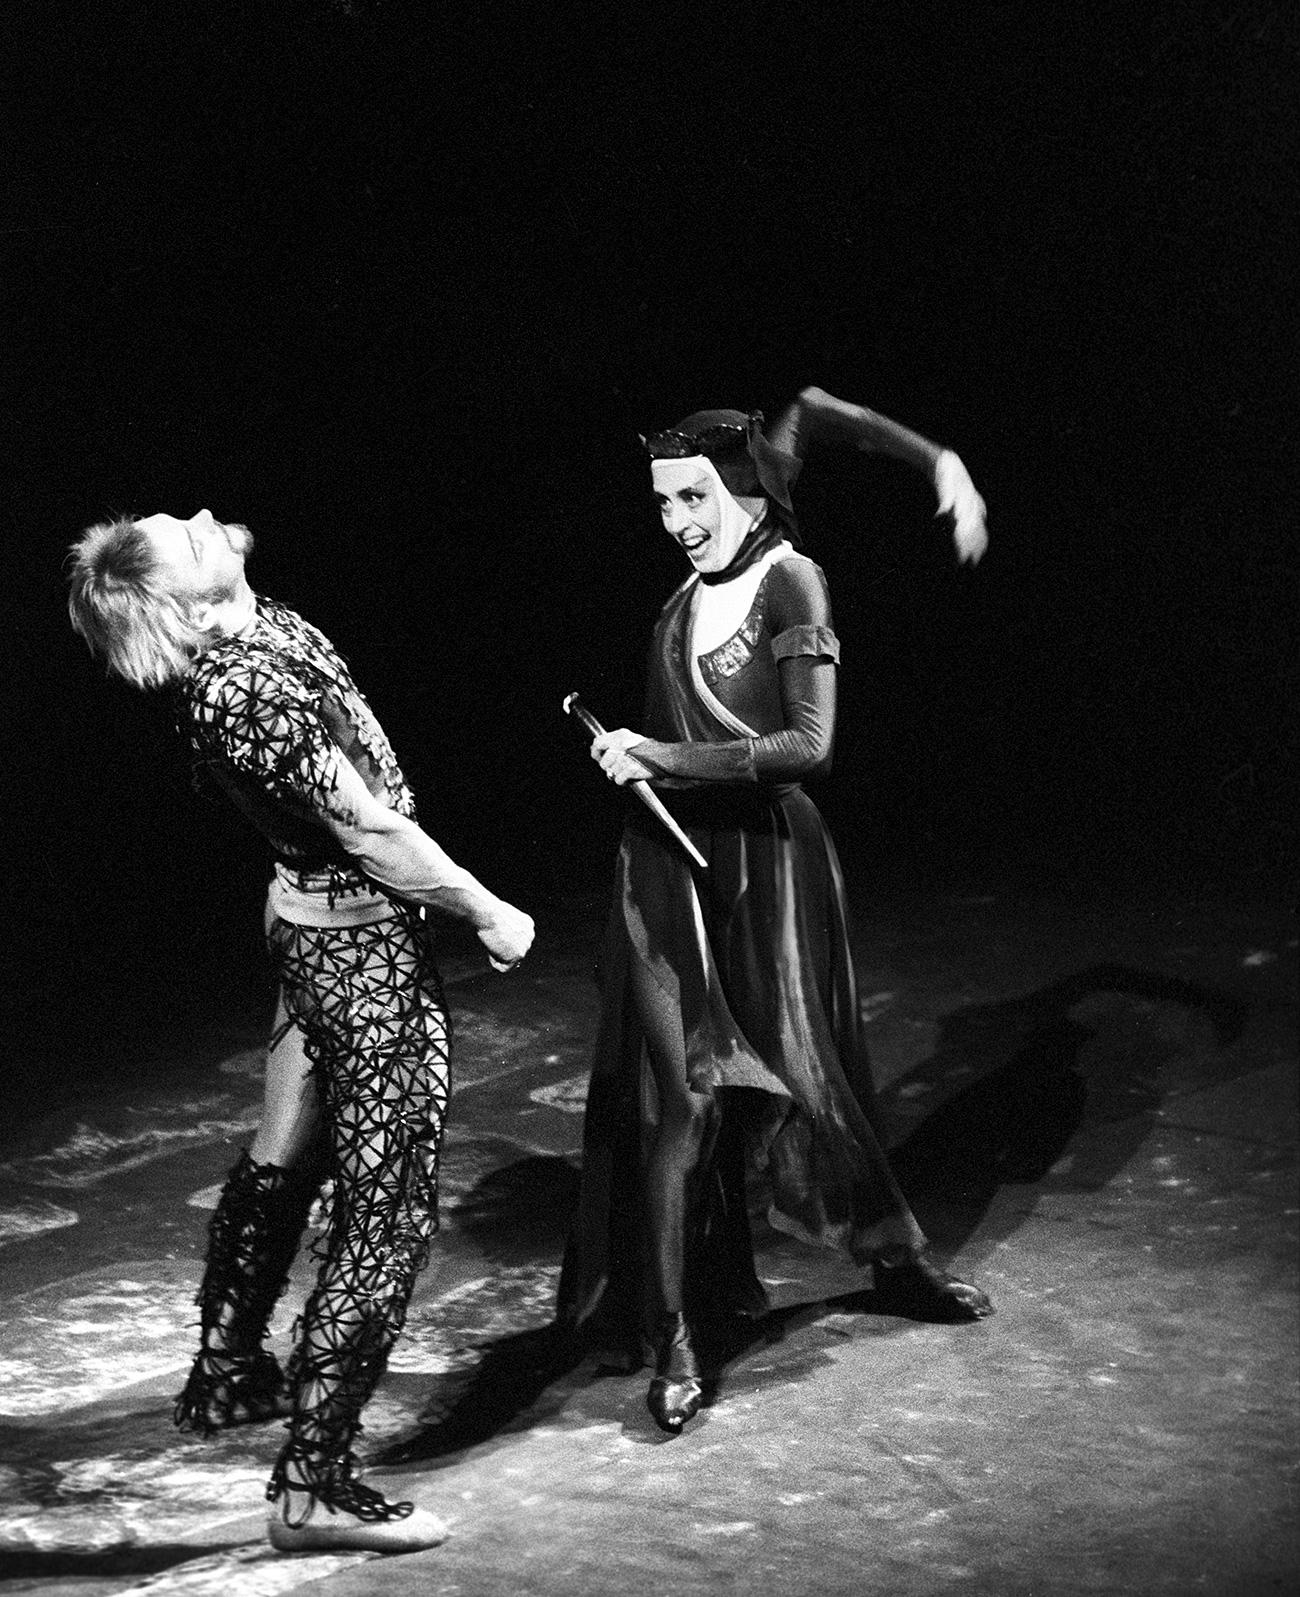 The State Academic Bolshoi Theater. Vladimir Vasiliev as Macbeth, Nina Timofeyeva as Lady Macbeth. / Alexander Makarov/RIA Novosti